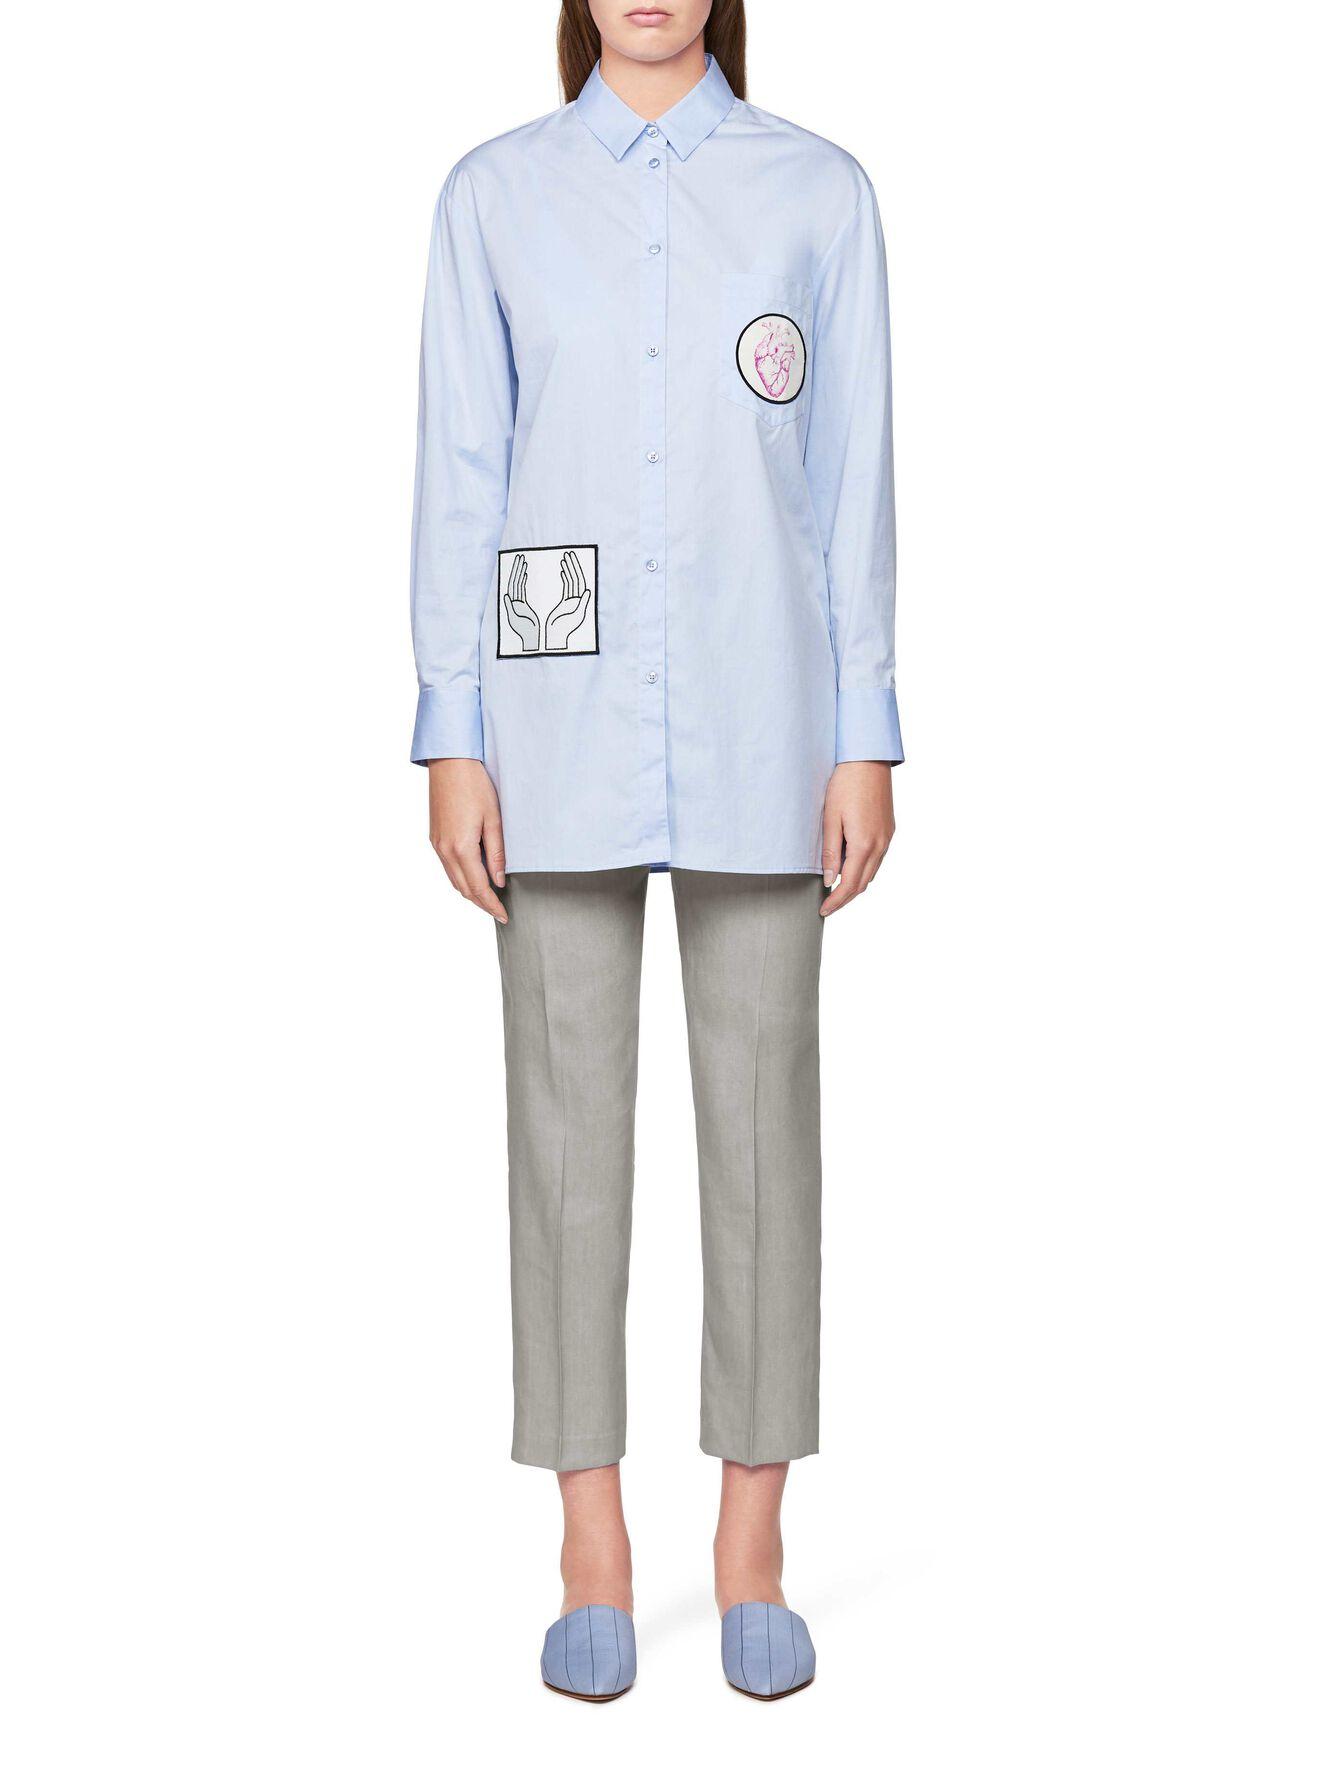 Allura Shirt in Art Deco Blue from Tiger of Sweden